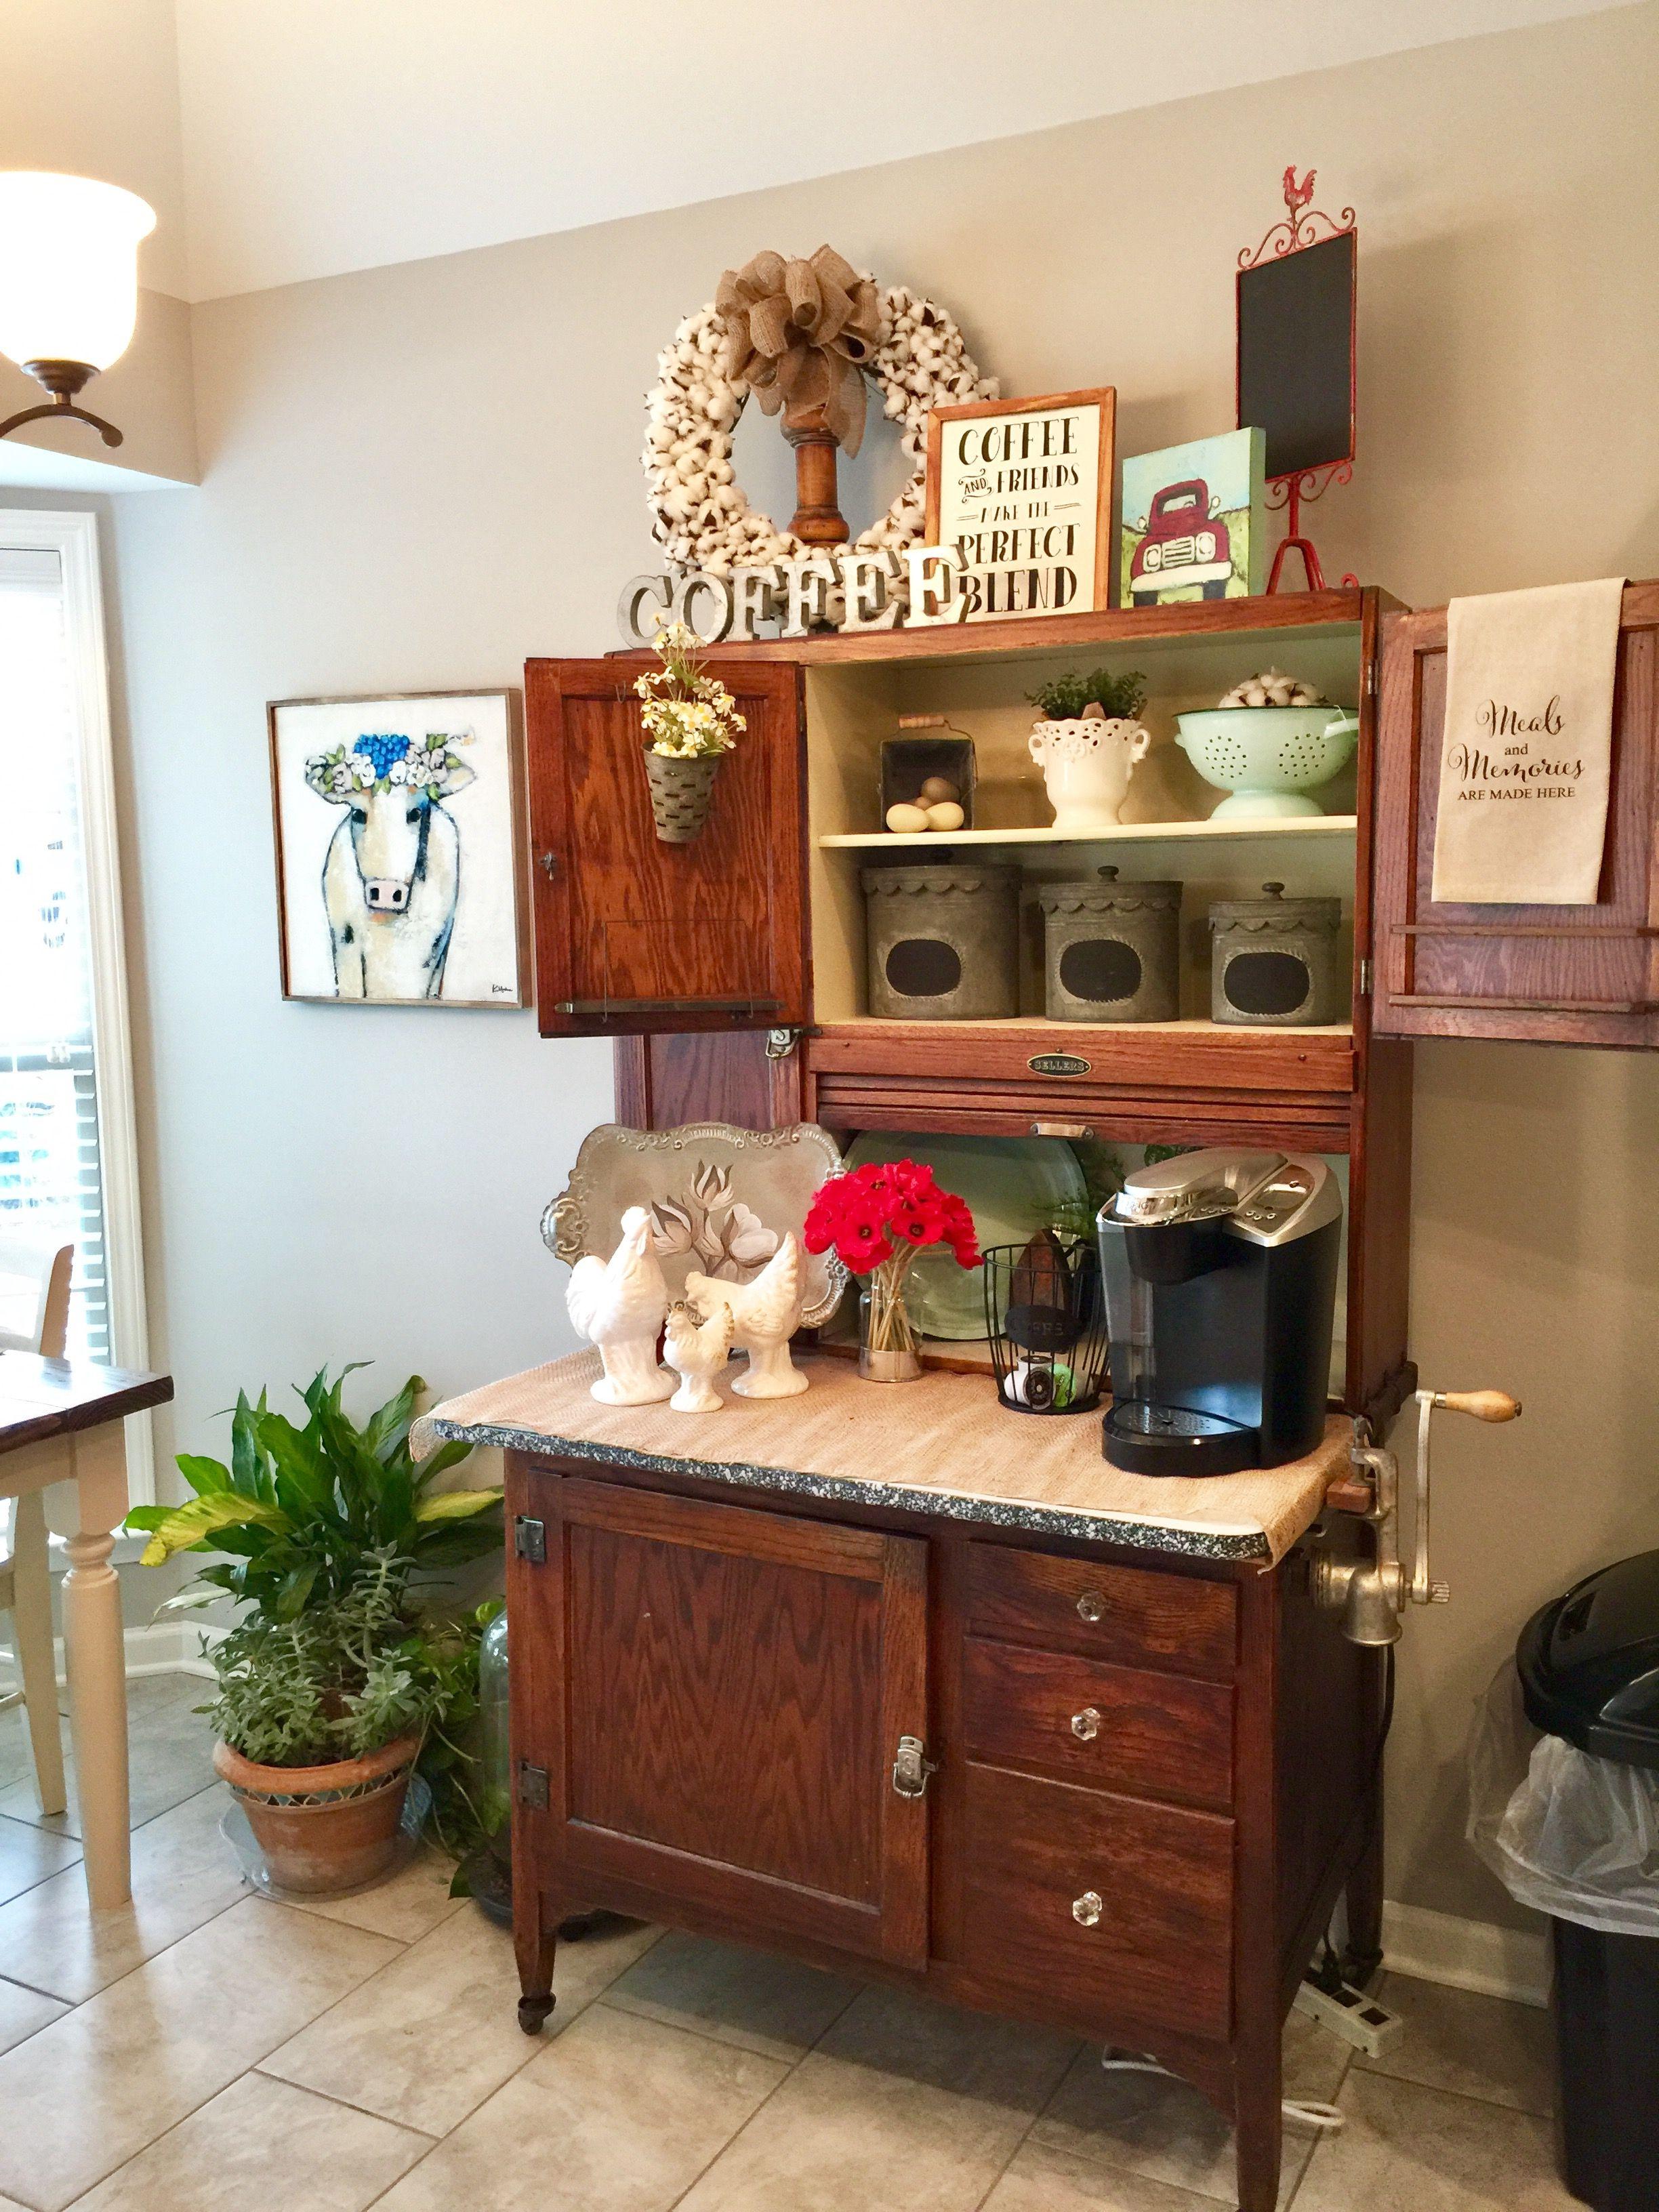 25 DIY Coffee Bar Ideas for Your